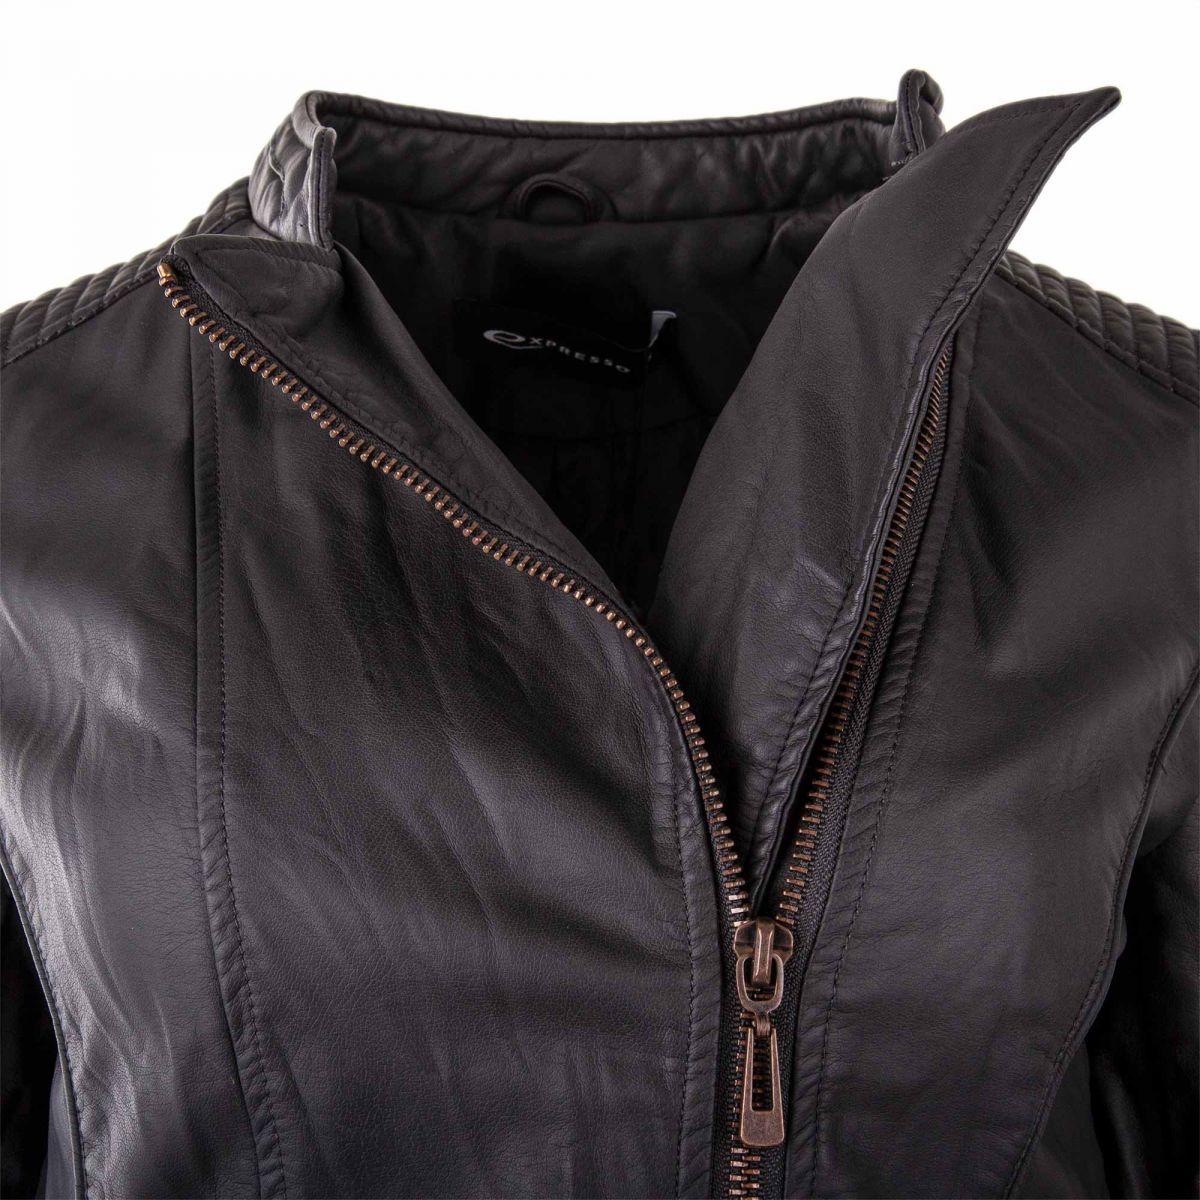 perfecto simili cuir femme expresso prix d griff. Black Bedroom Furniture Sets. Home Design Ideas